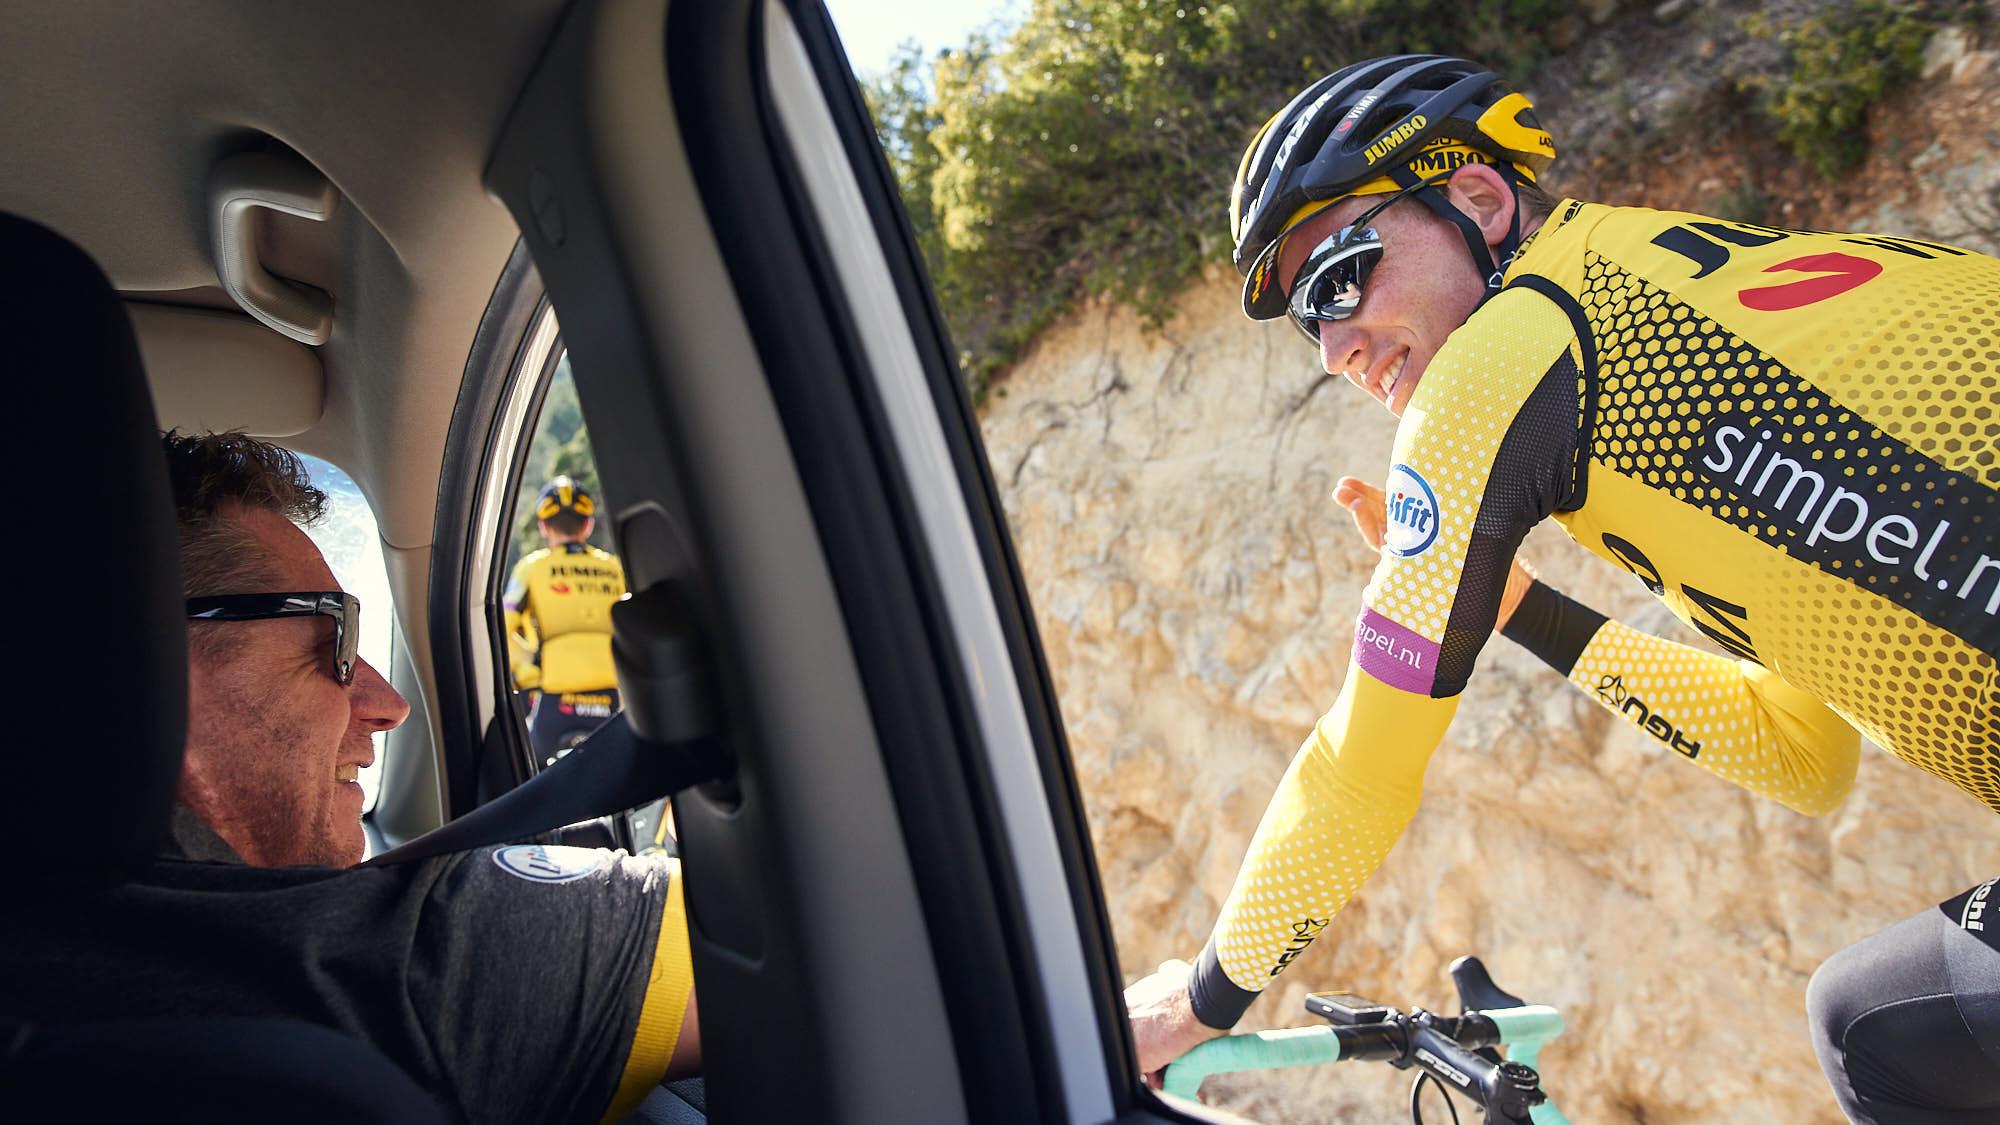 Jumbo-Visma rider Mike Teunissen during Alicante training stage